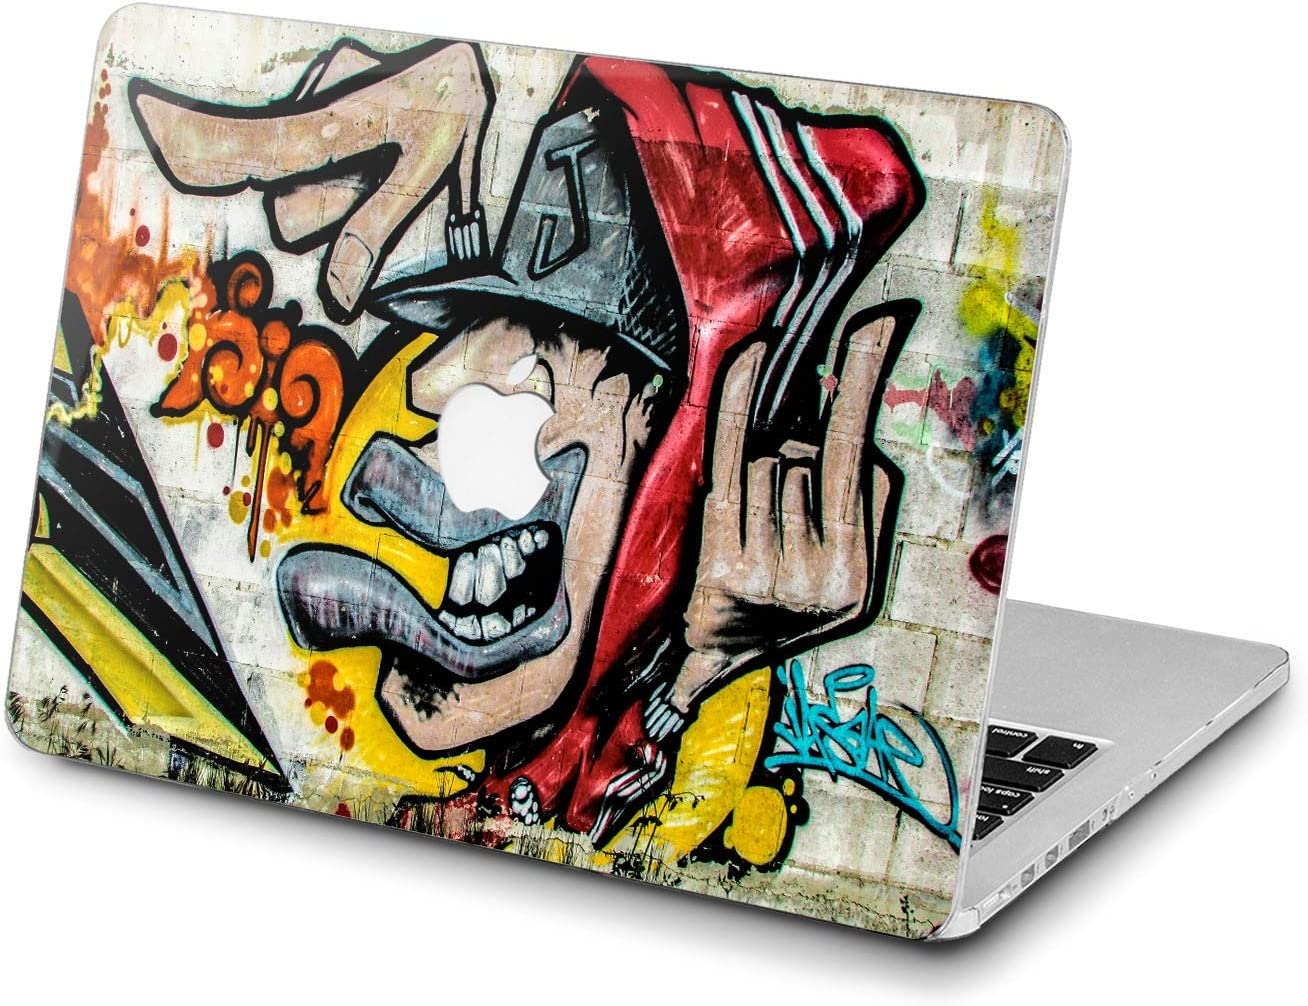 Lex Altern Hard Case for Apple MacBook Pro 15 Air 13 inch Mac Retina 12 11 2020 2019 2018 2017 2016 Graffiti Touch Bar Shell Cool Cover Art Yellow Print Street Design Colorful Laptop Women Urban